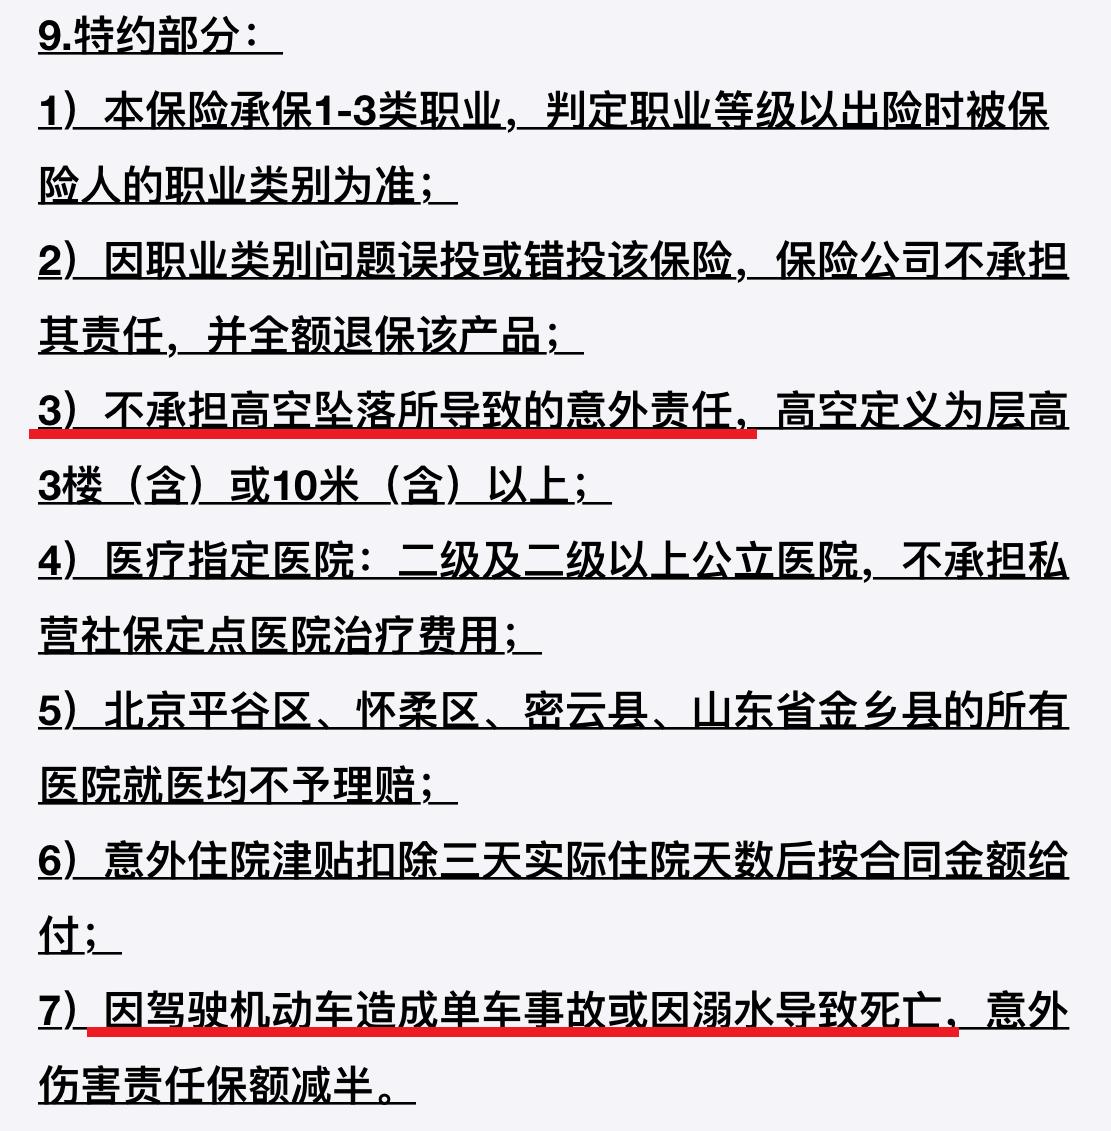 新华保险 - 副本.png